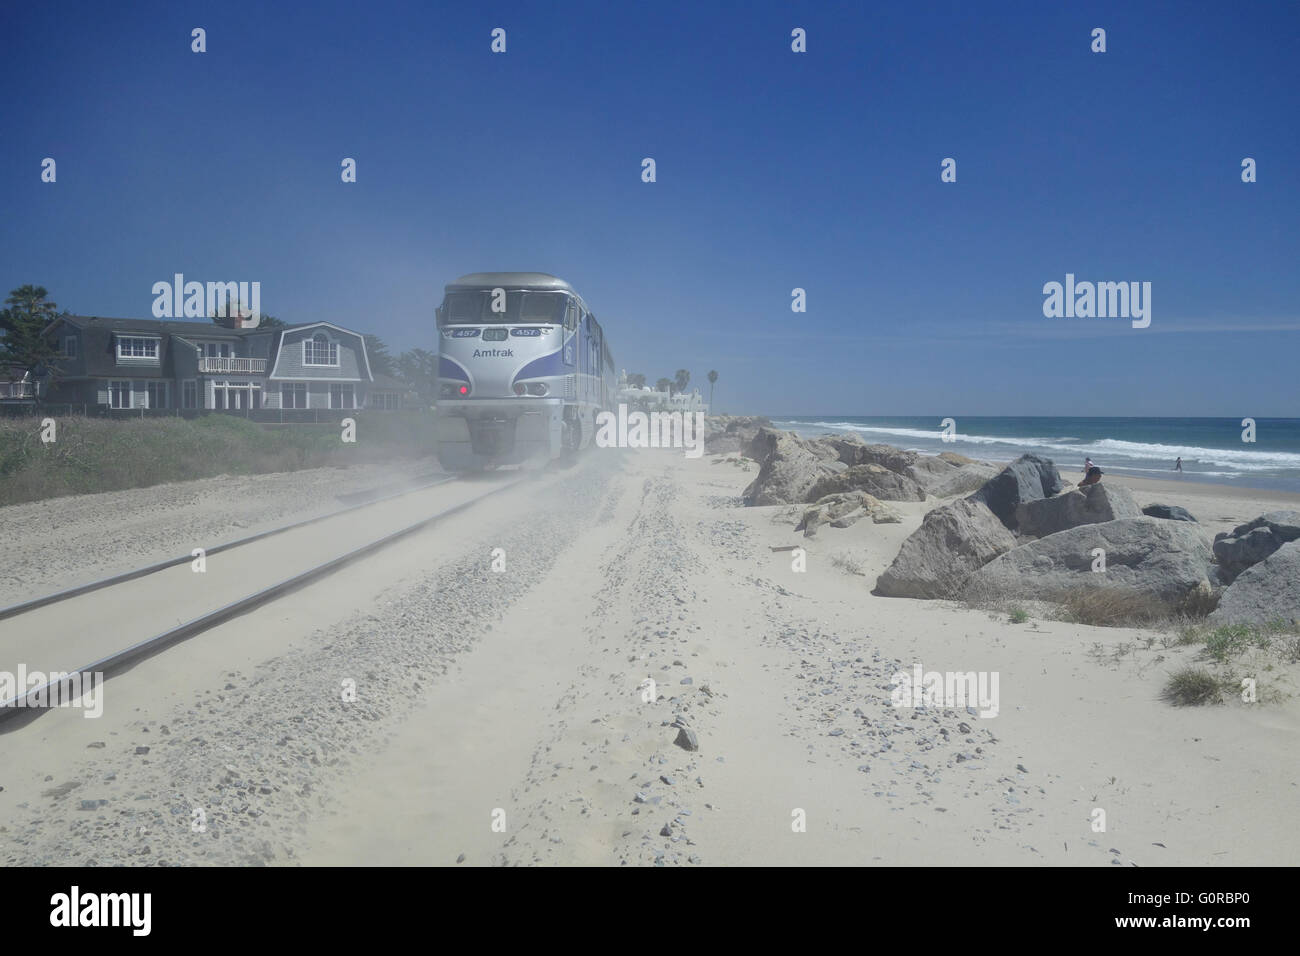 Amtrak Surfliner locomotive and passenger train on railroad tracks beside sandy beach near Santa Barbara Southern - Stock Image